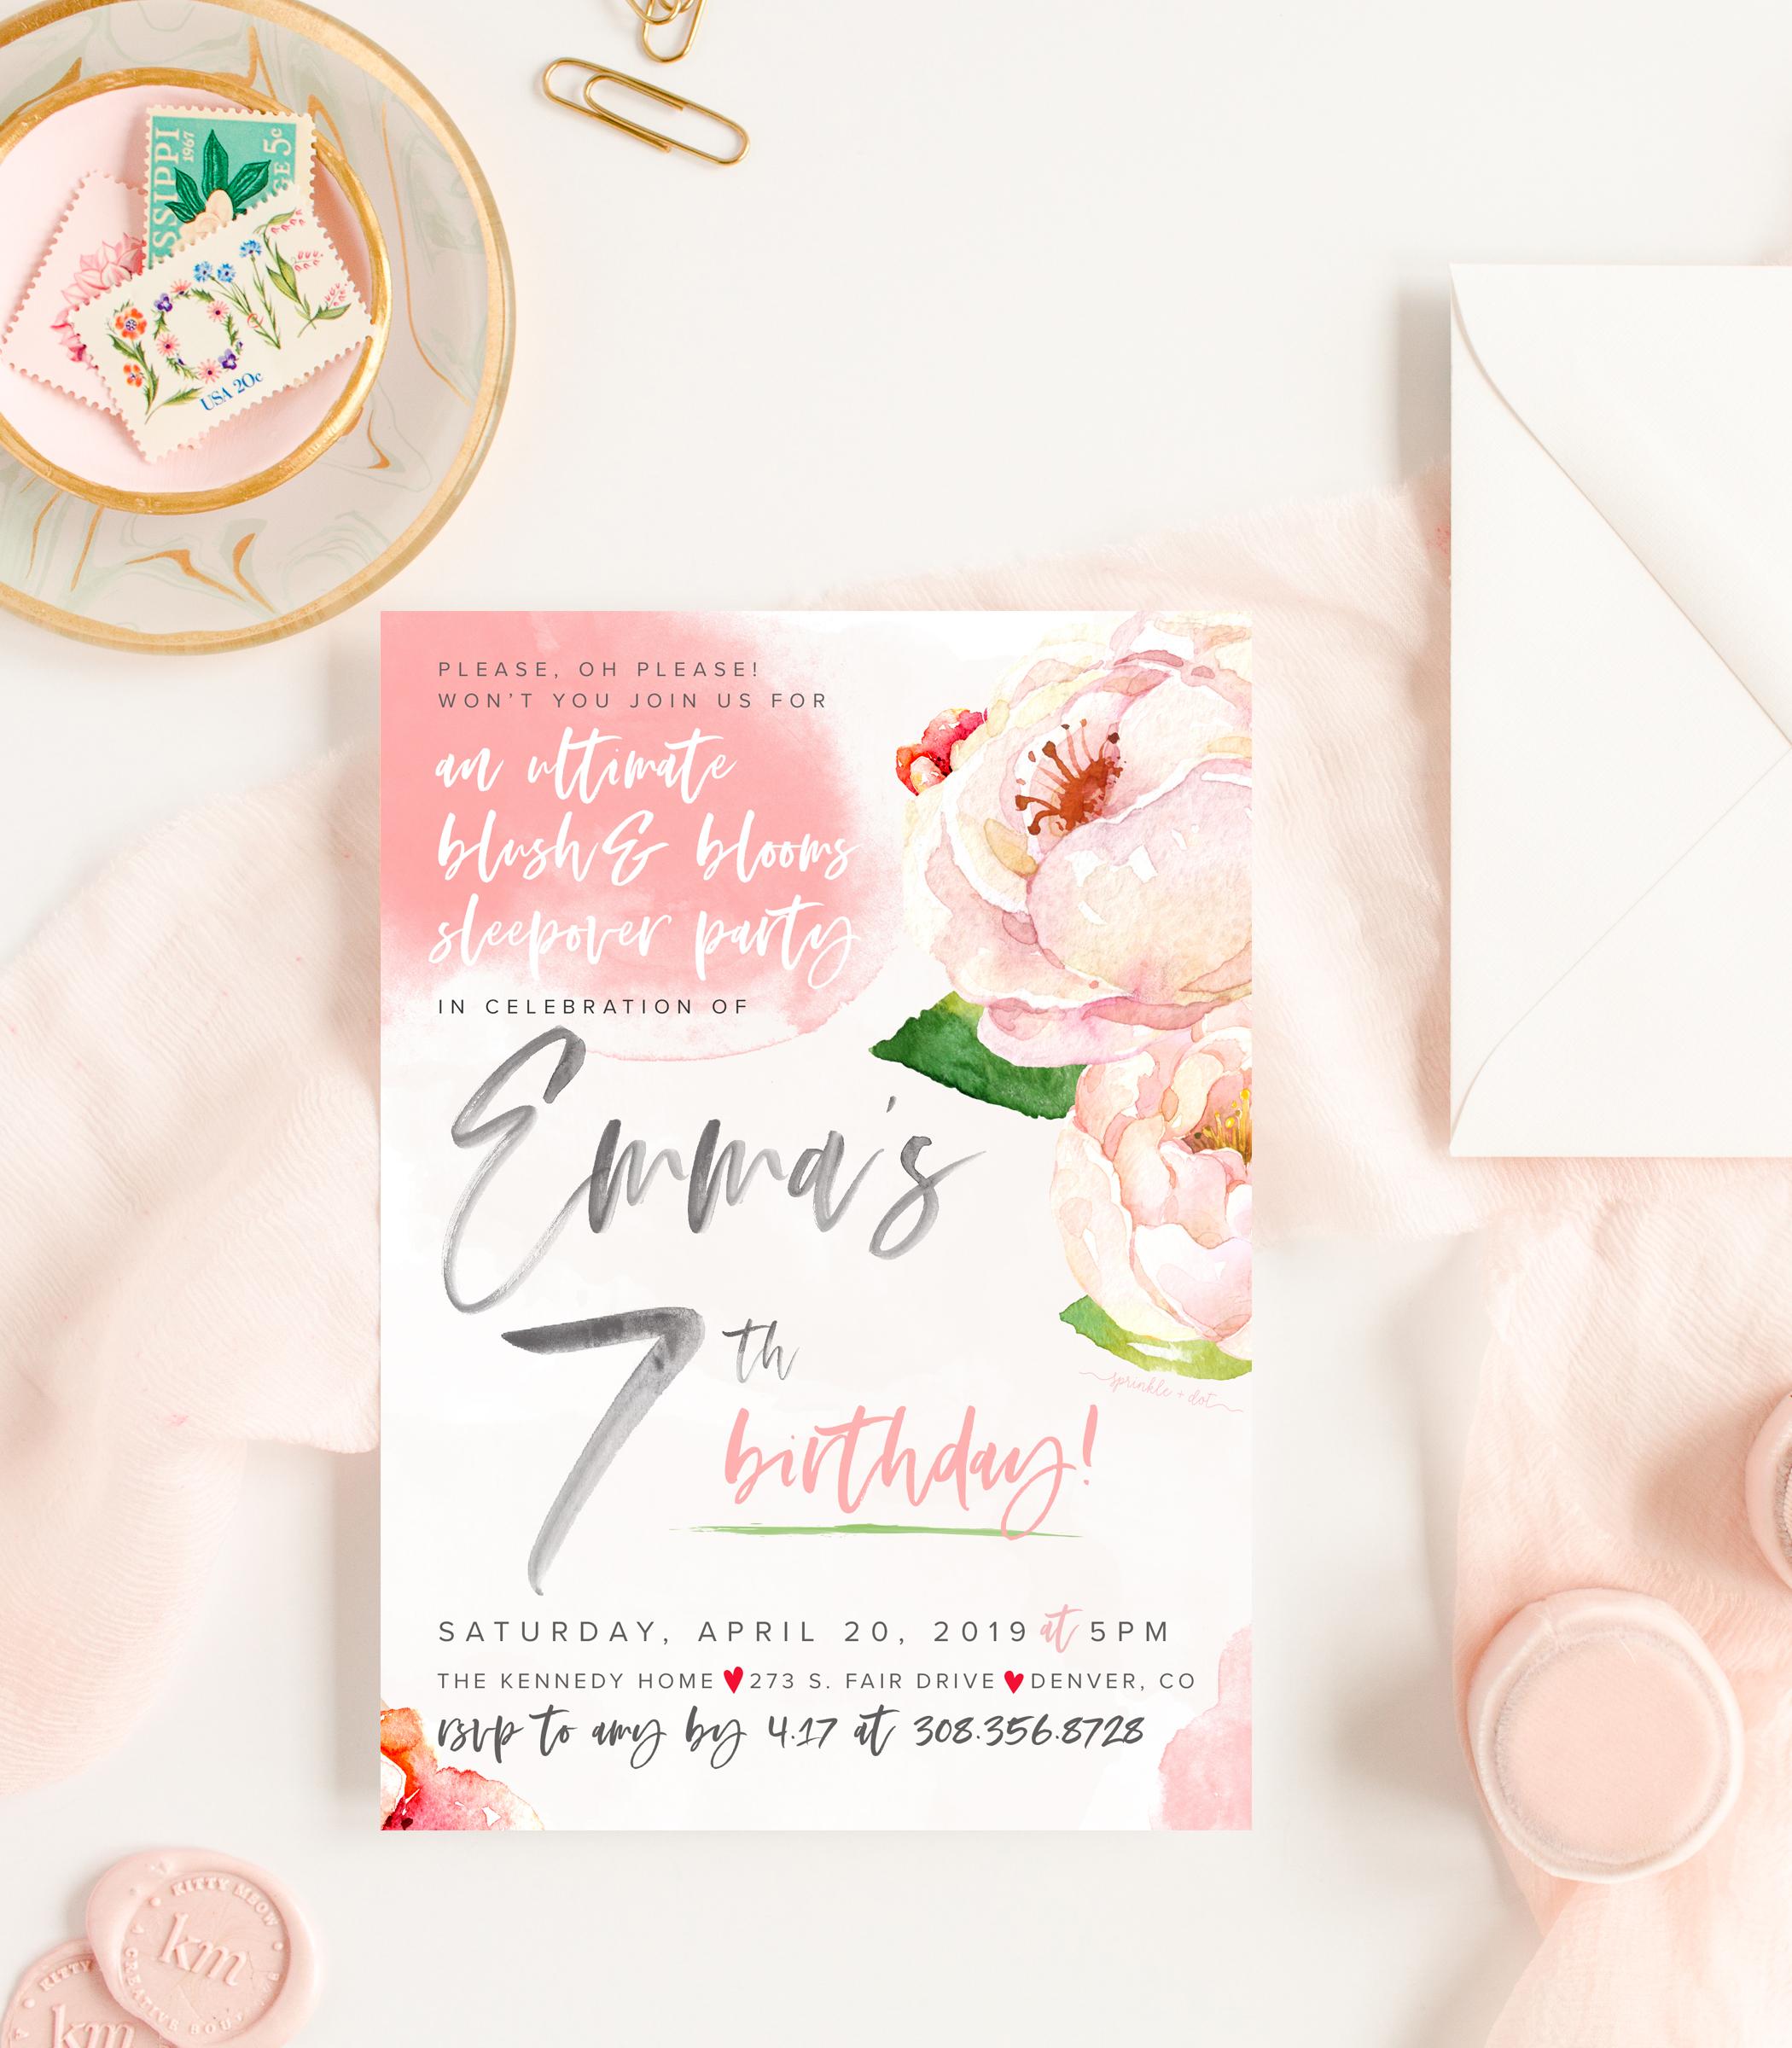 custom digital invitation  |  $35